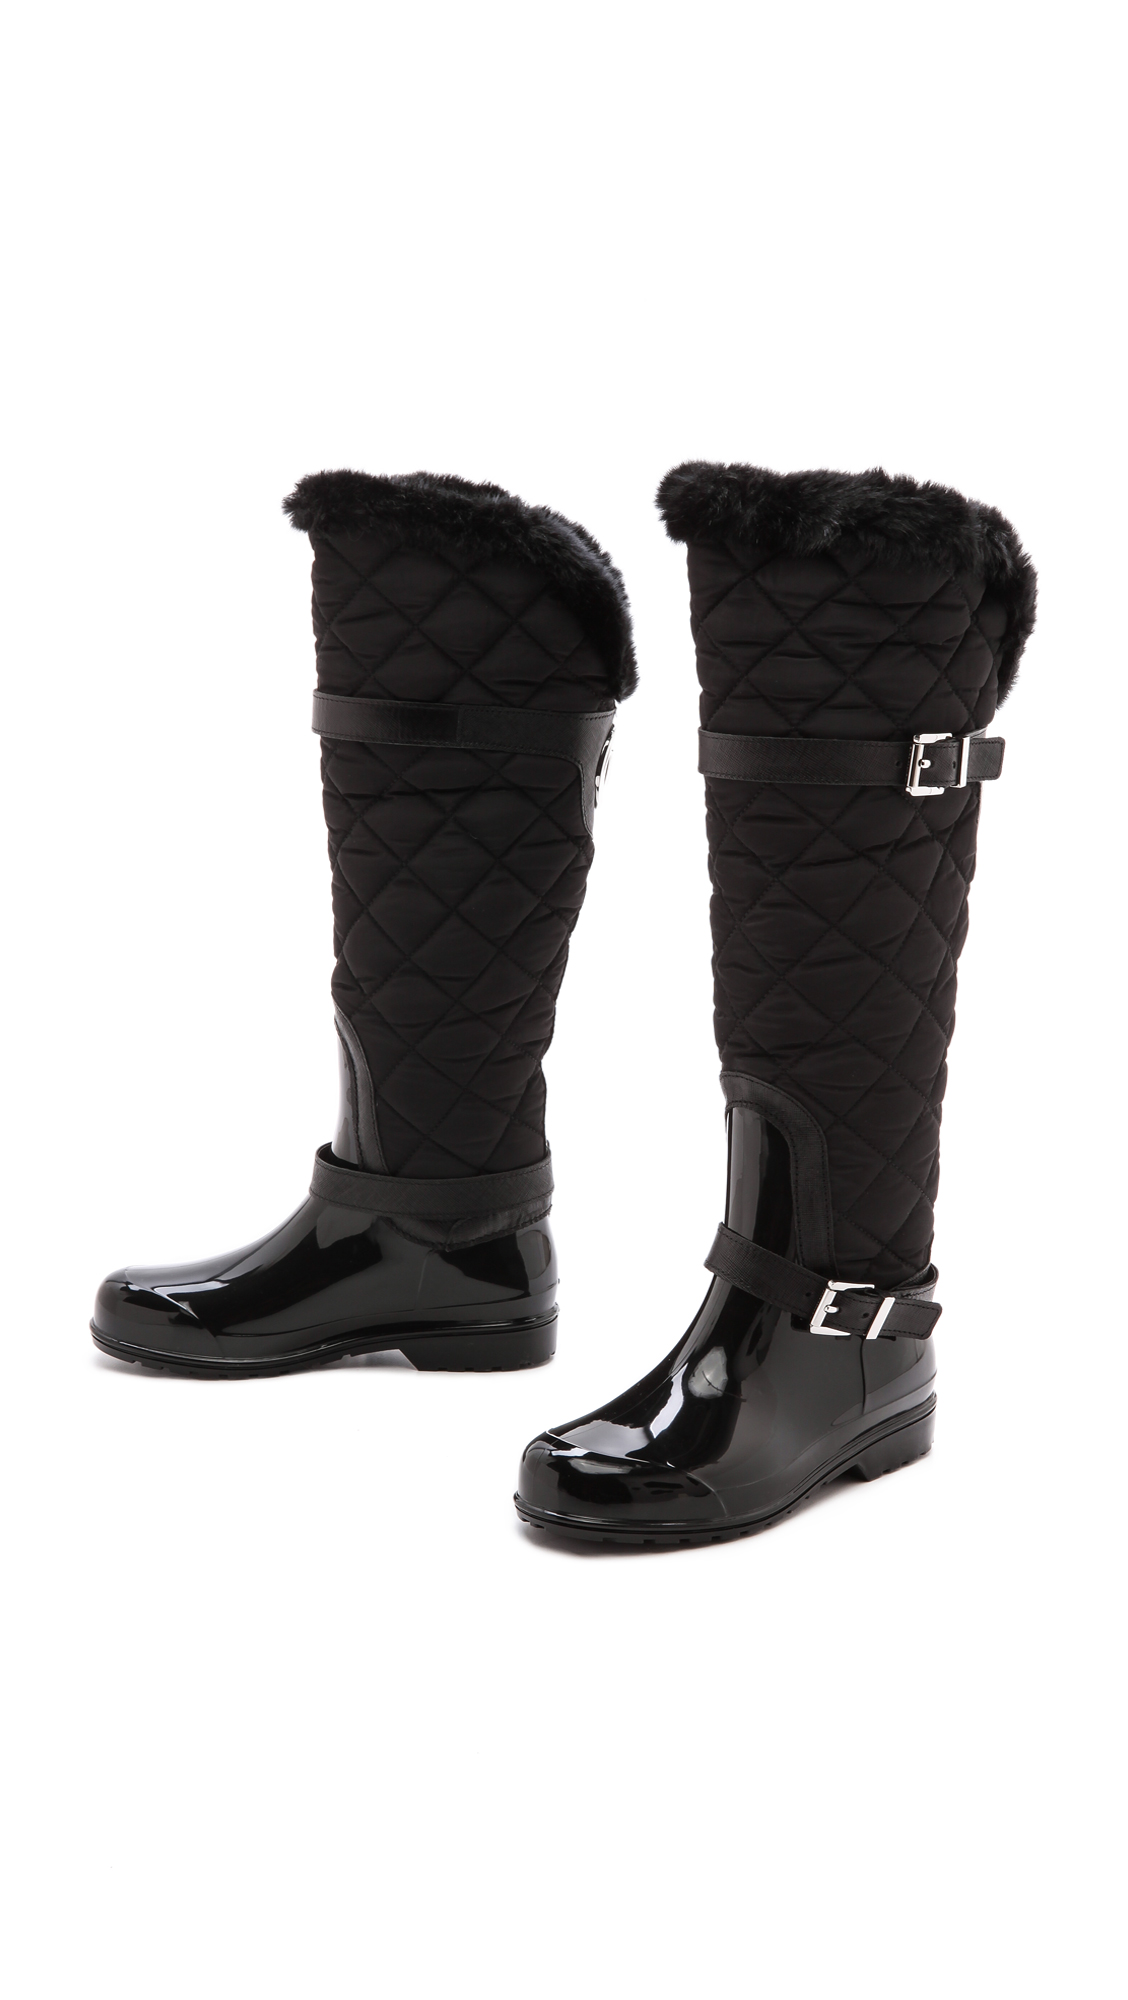 MICHAEL Michael Kors Fulton Quilted Rain Boots | SHOPBOP : michael kors fulton quilt - Adamdwight.com